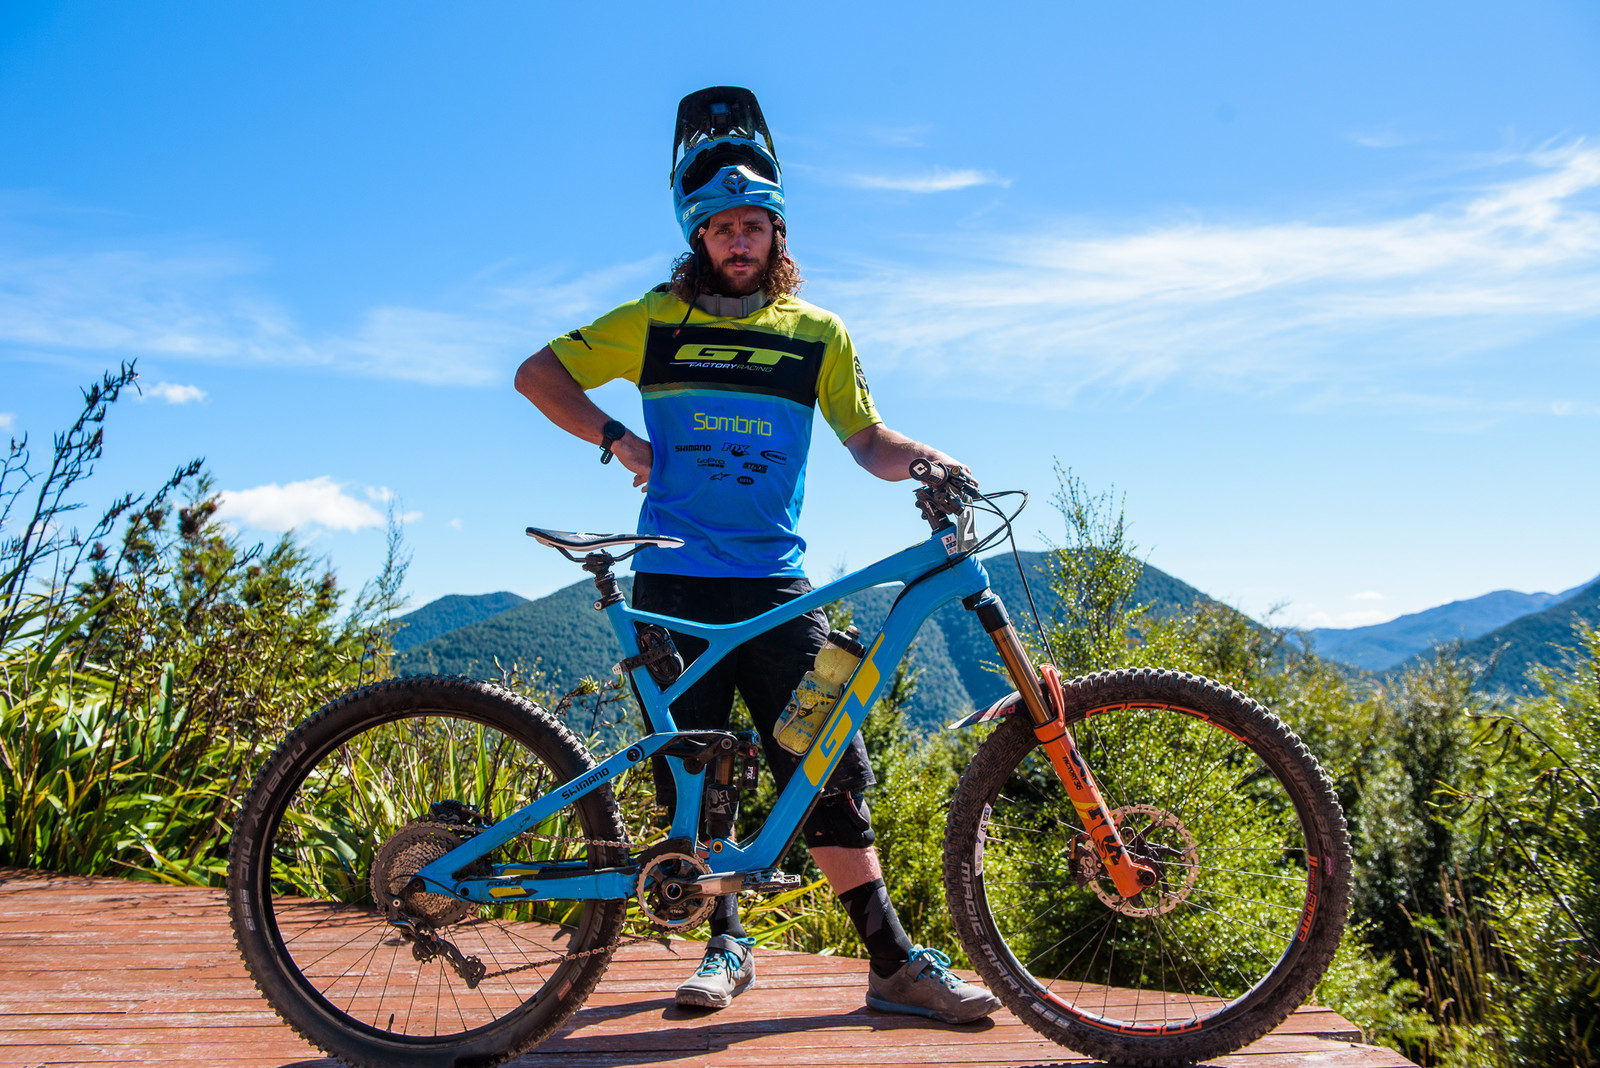 Pro Bike - Wyn Masters' GT Force, Size XL - Pro Bike - Wyn Masters' GT Force, Size XL - Mountain Biking Pictures - Vital MTB